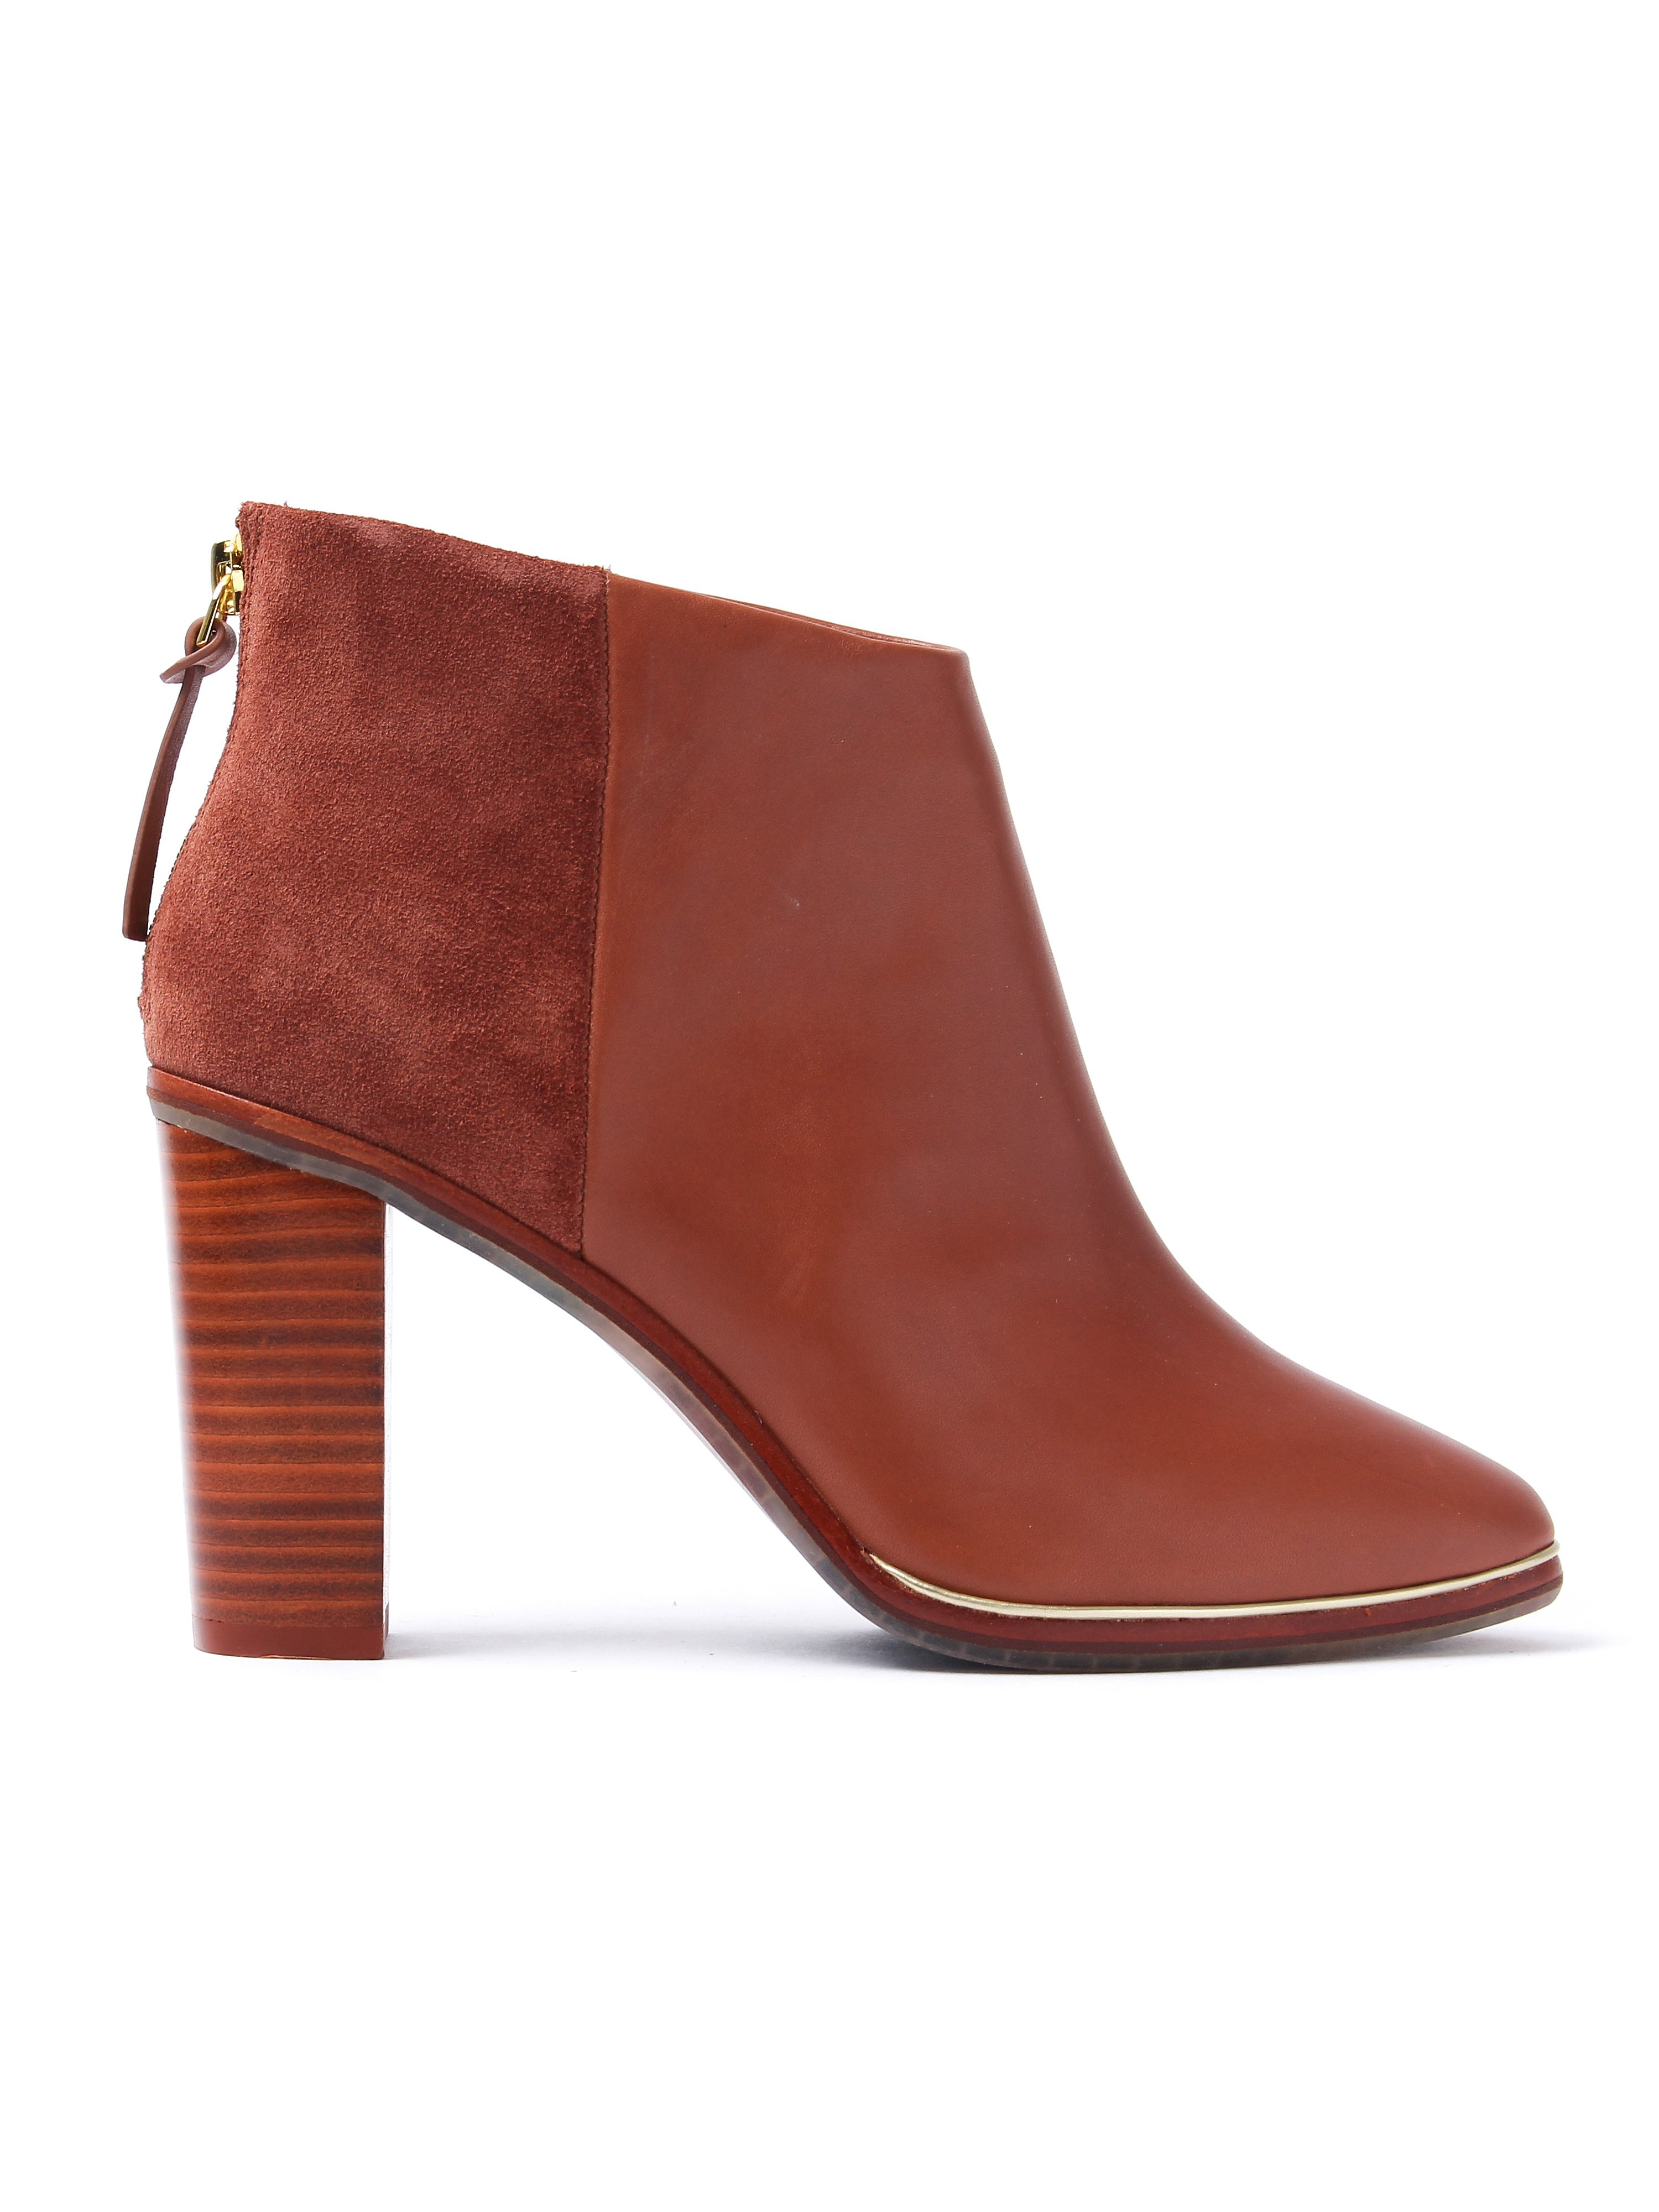 Ted Baker Women's Azalia Boots - Tan Leather Suede